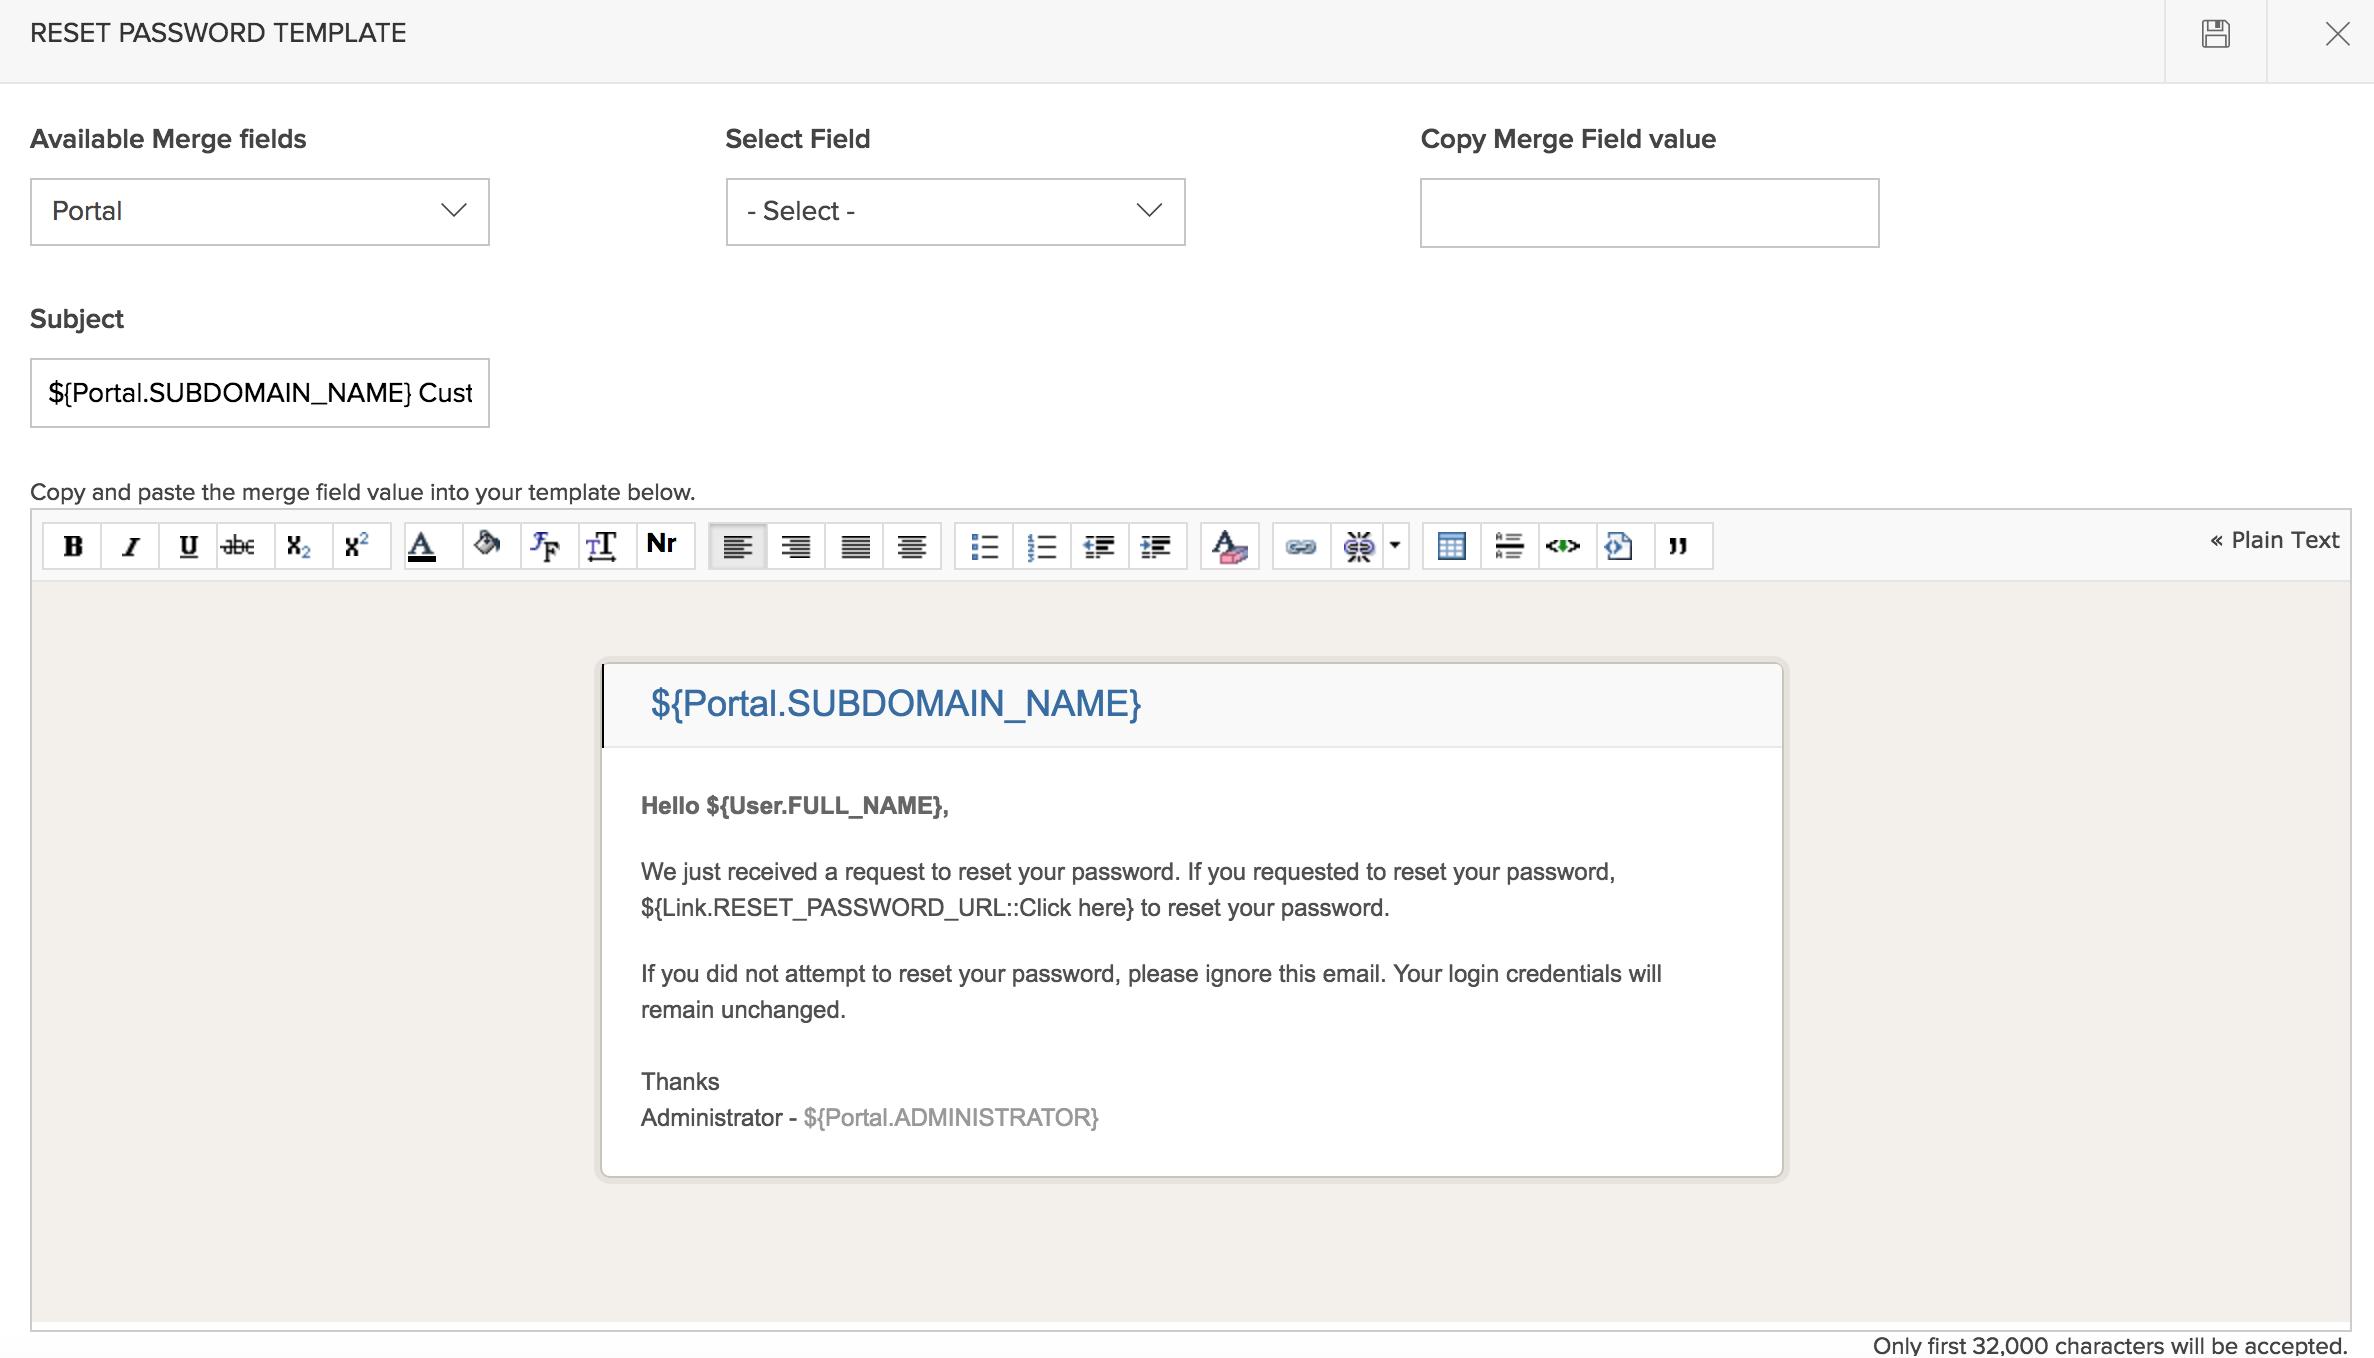 Customize Reset Password Template for the Customer Portal